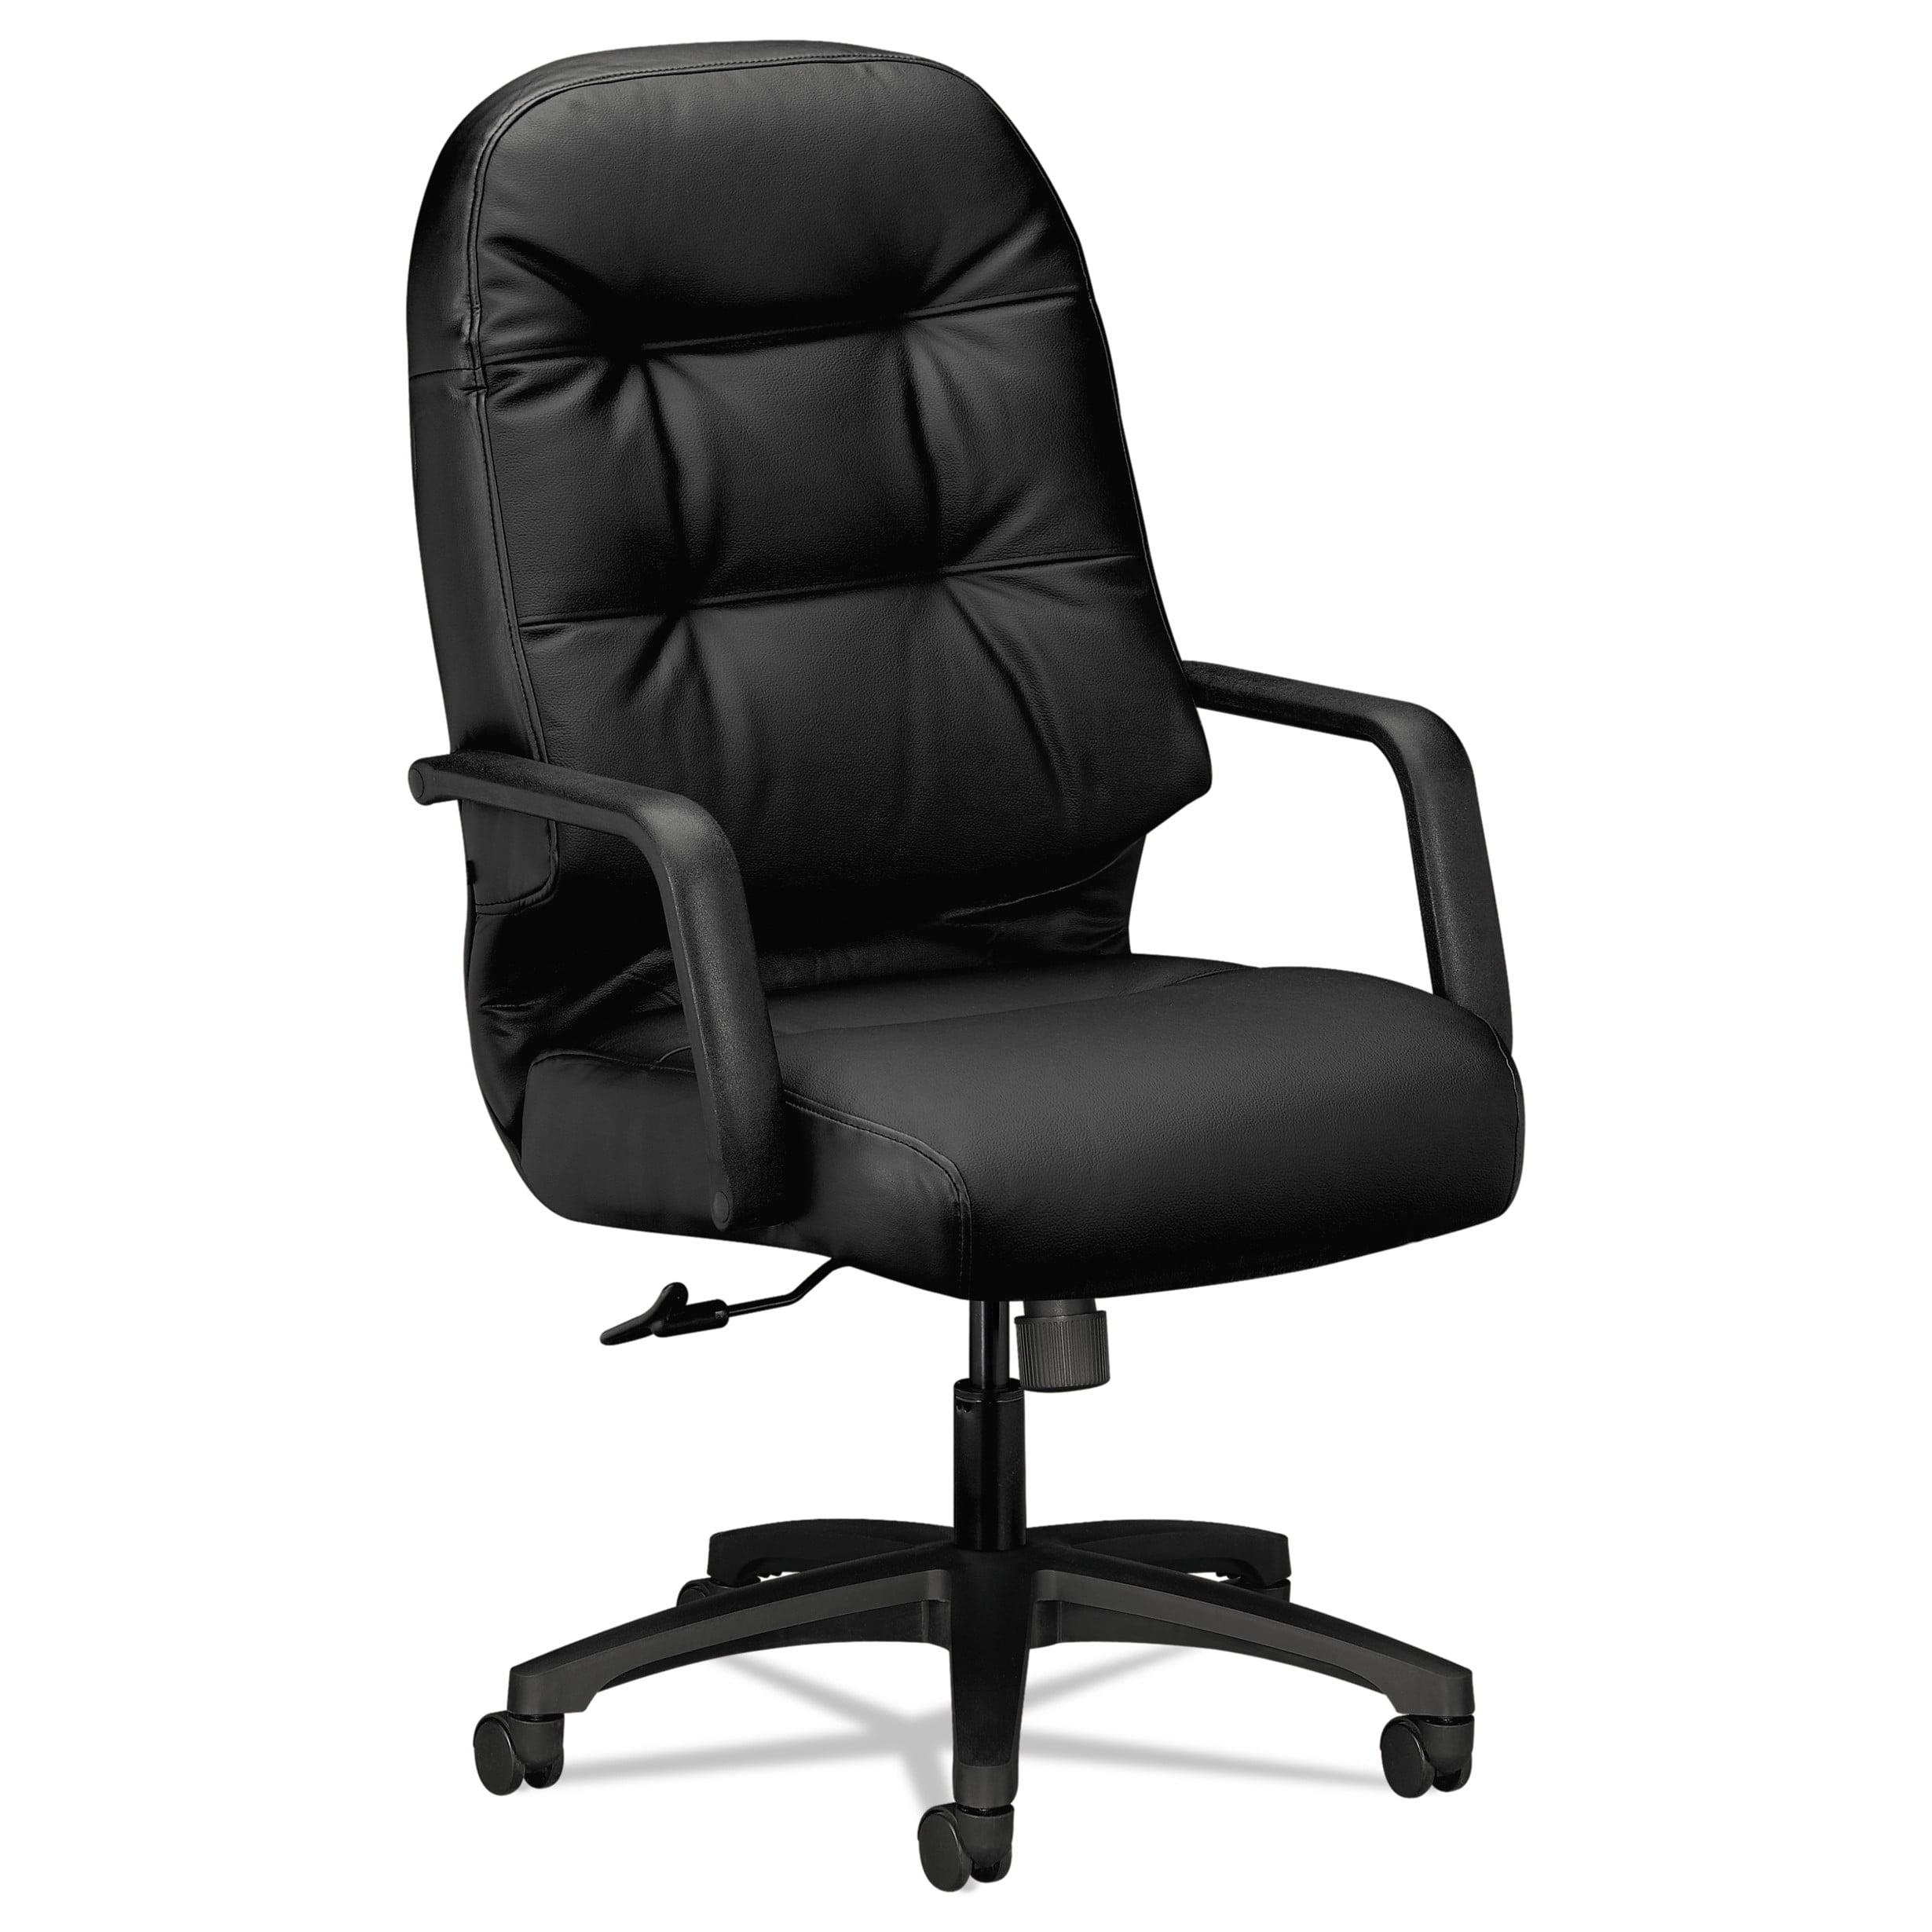 HON 2090 Pillow-Soft Series Executive Leather High-Back Swivel/Tilt Chair, Black